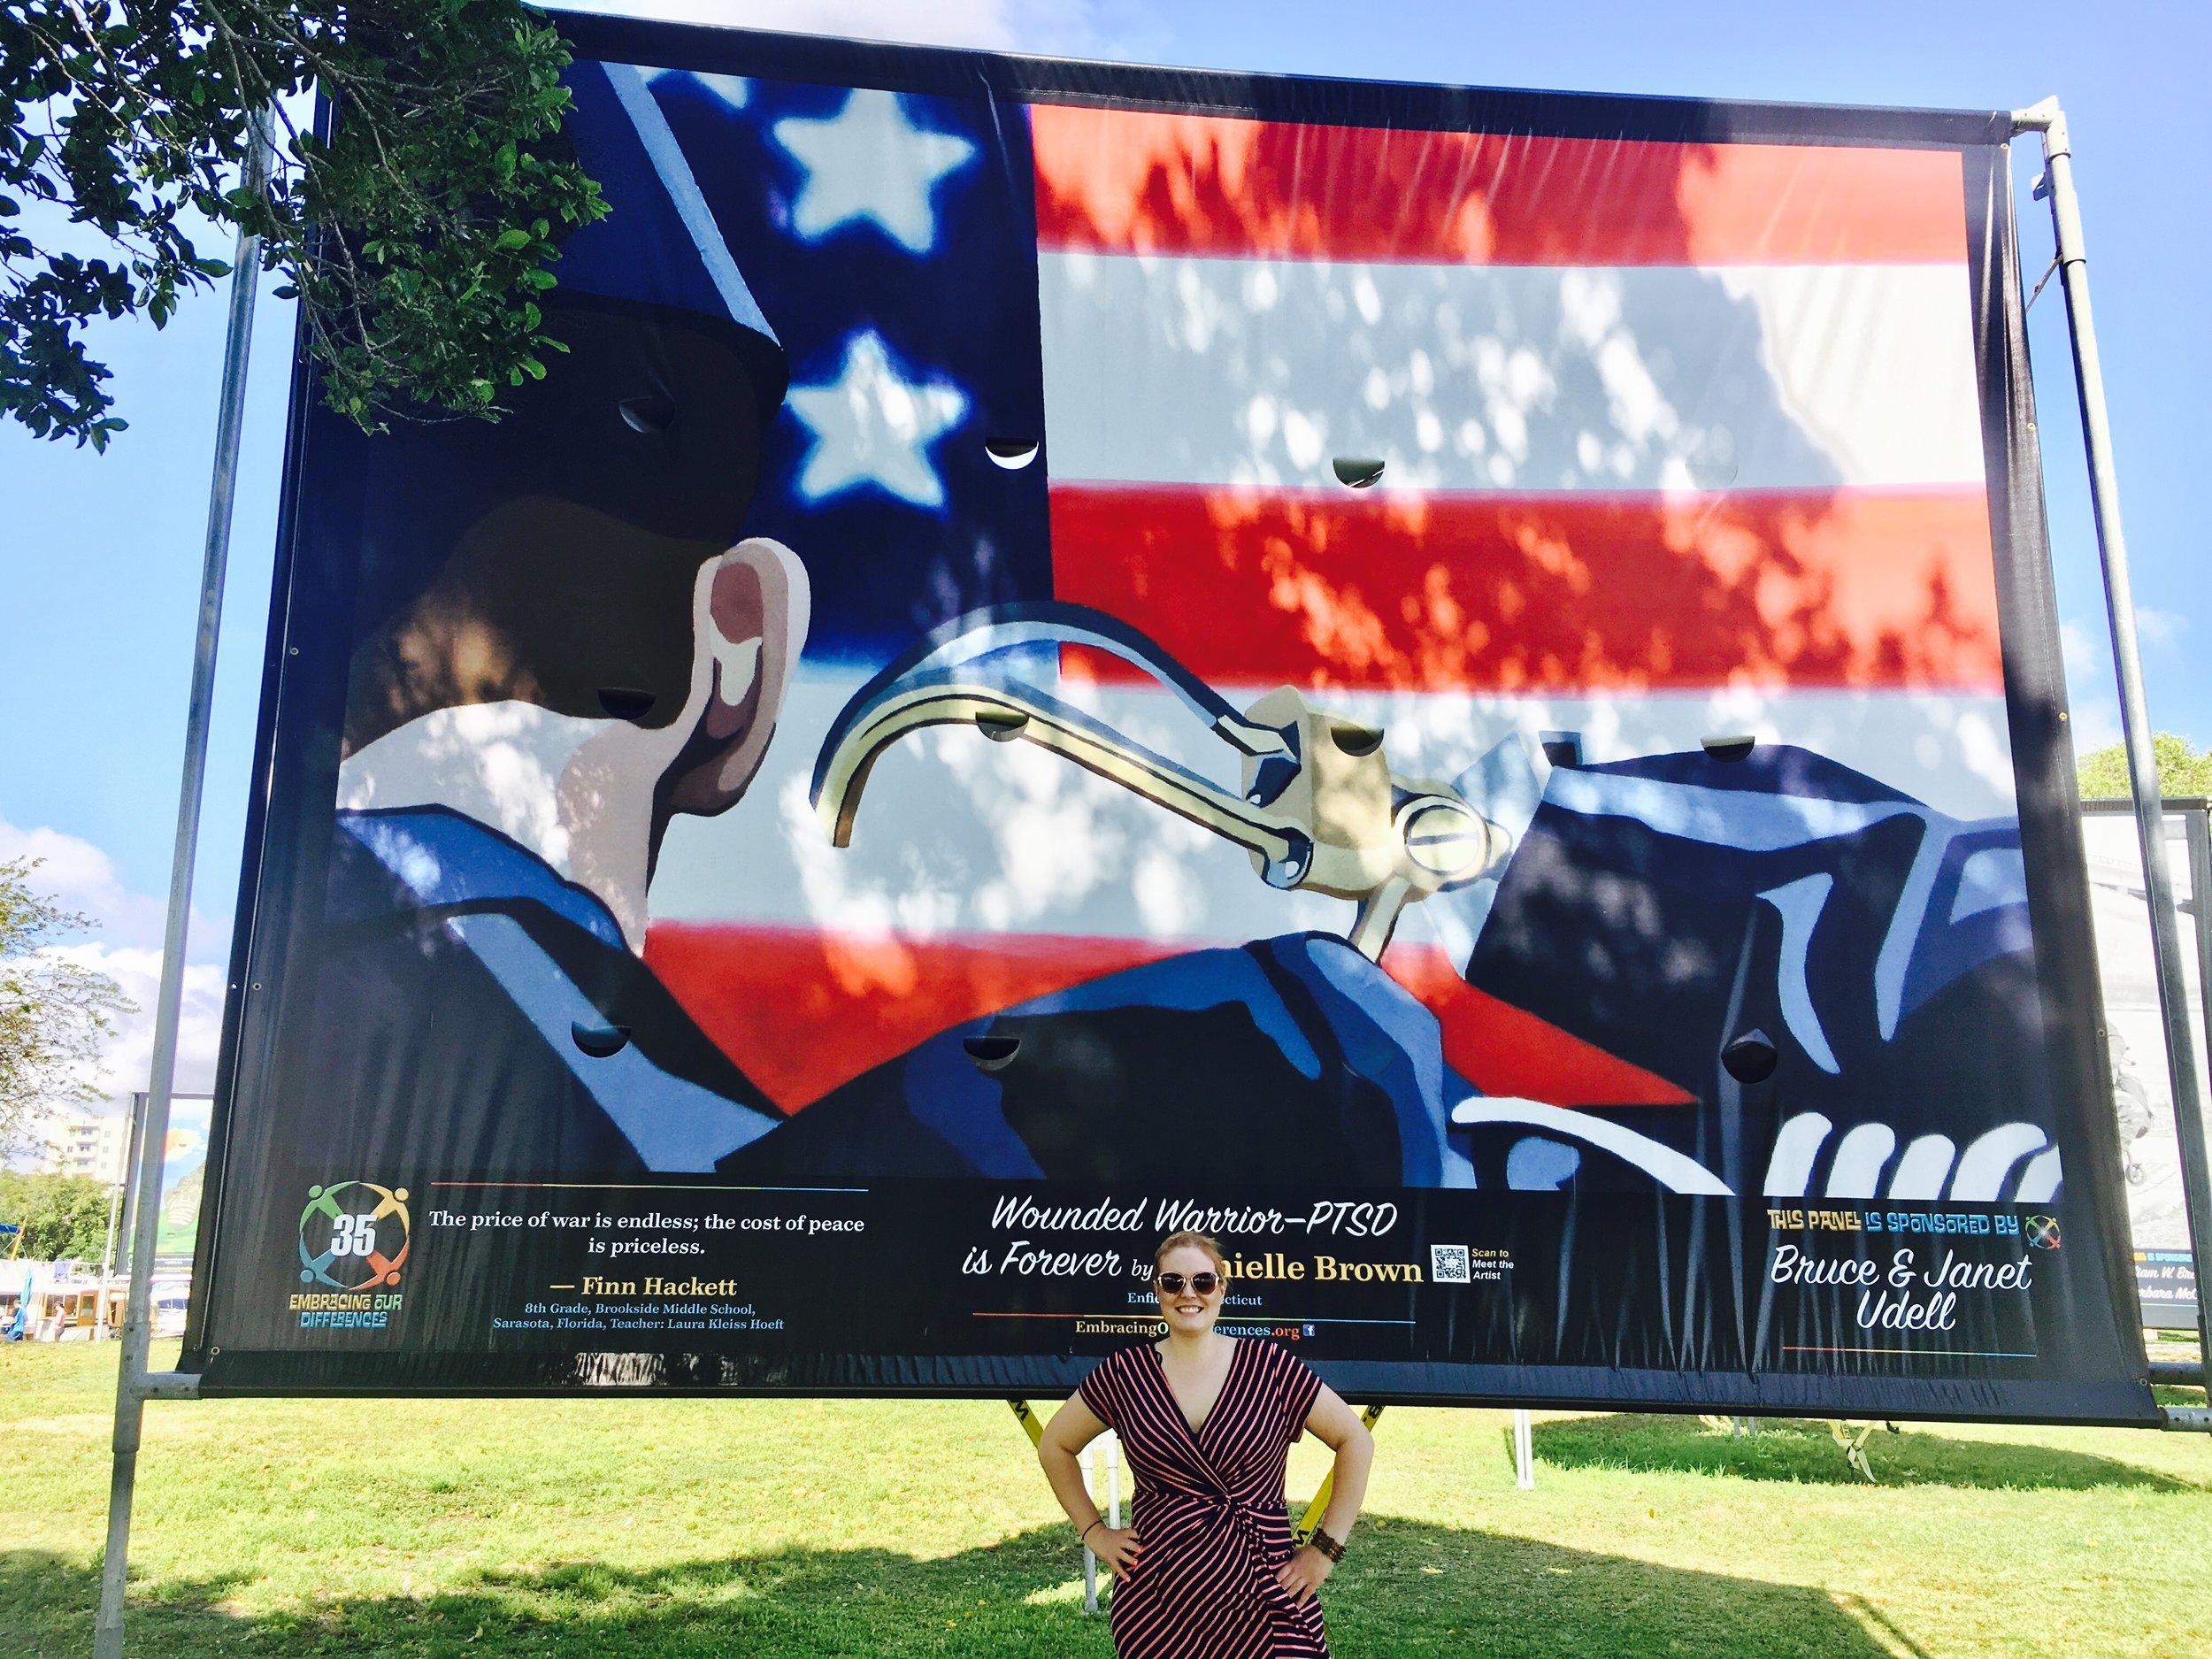 Wounded Warrior - PTSD on display at Island Park in Sarasota, Florida.